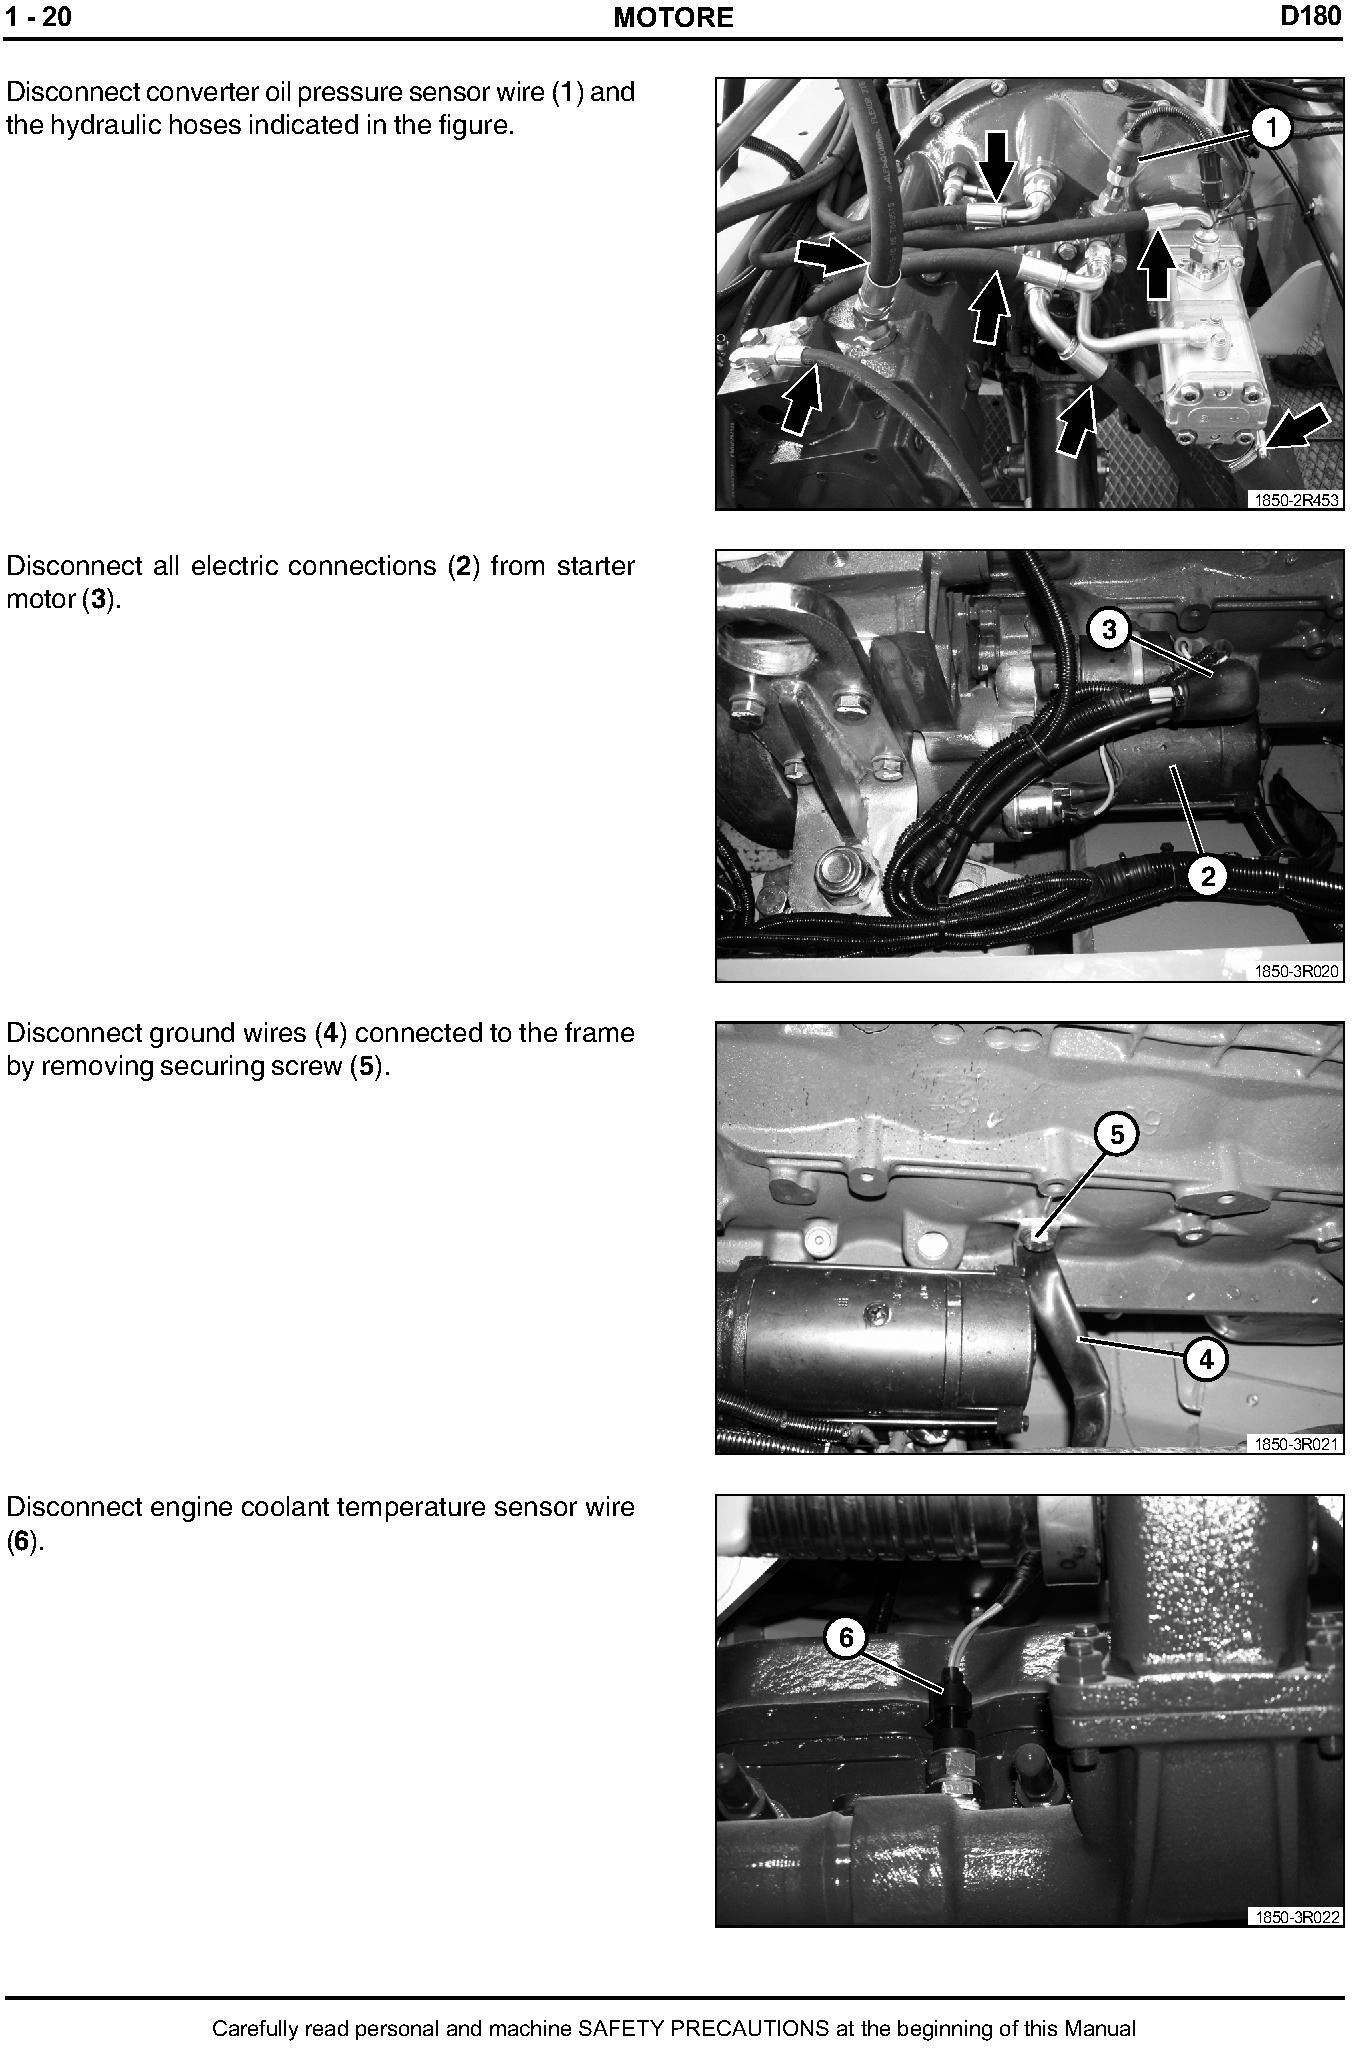 New Holland D180 Crawler Dozer Tier 3 Workshop Service Manual - 3